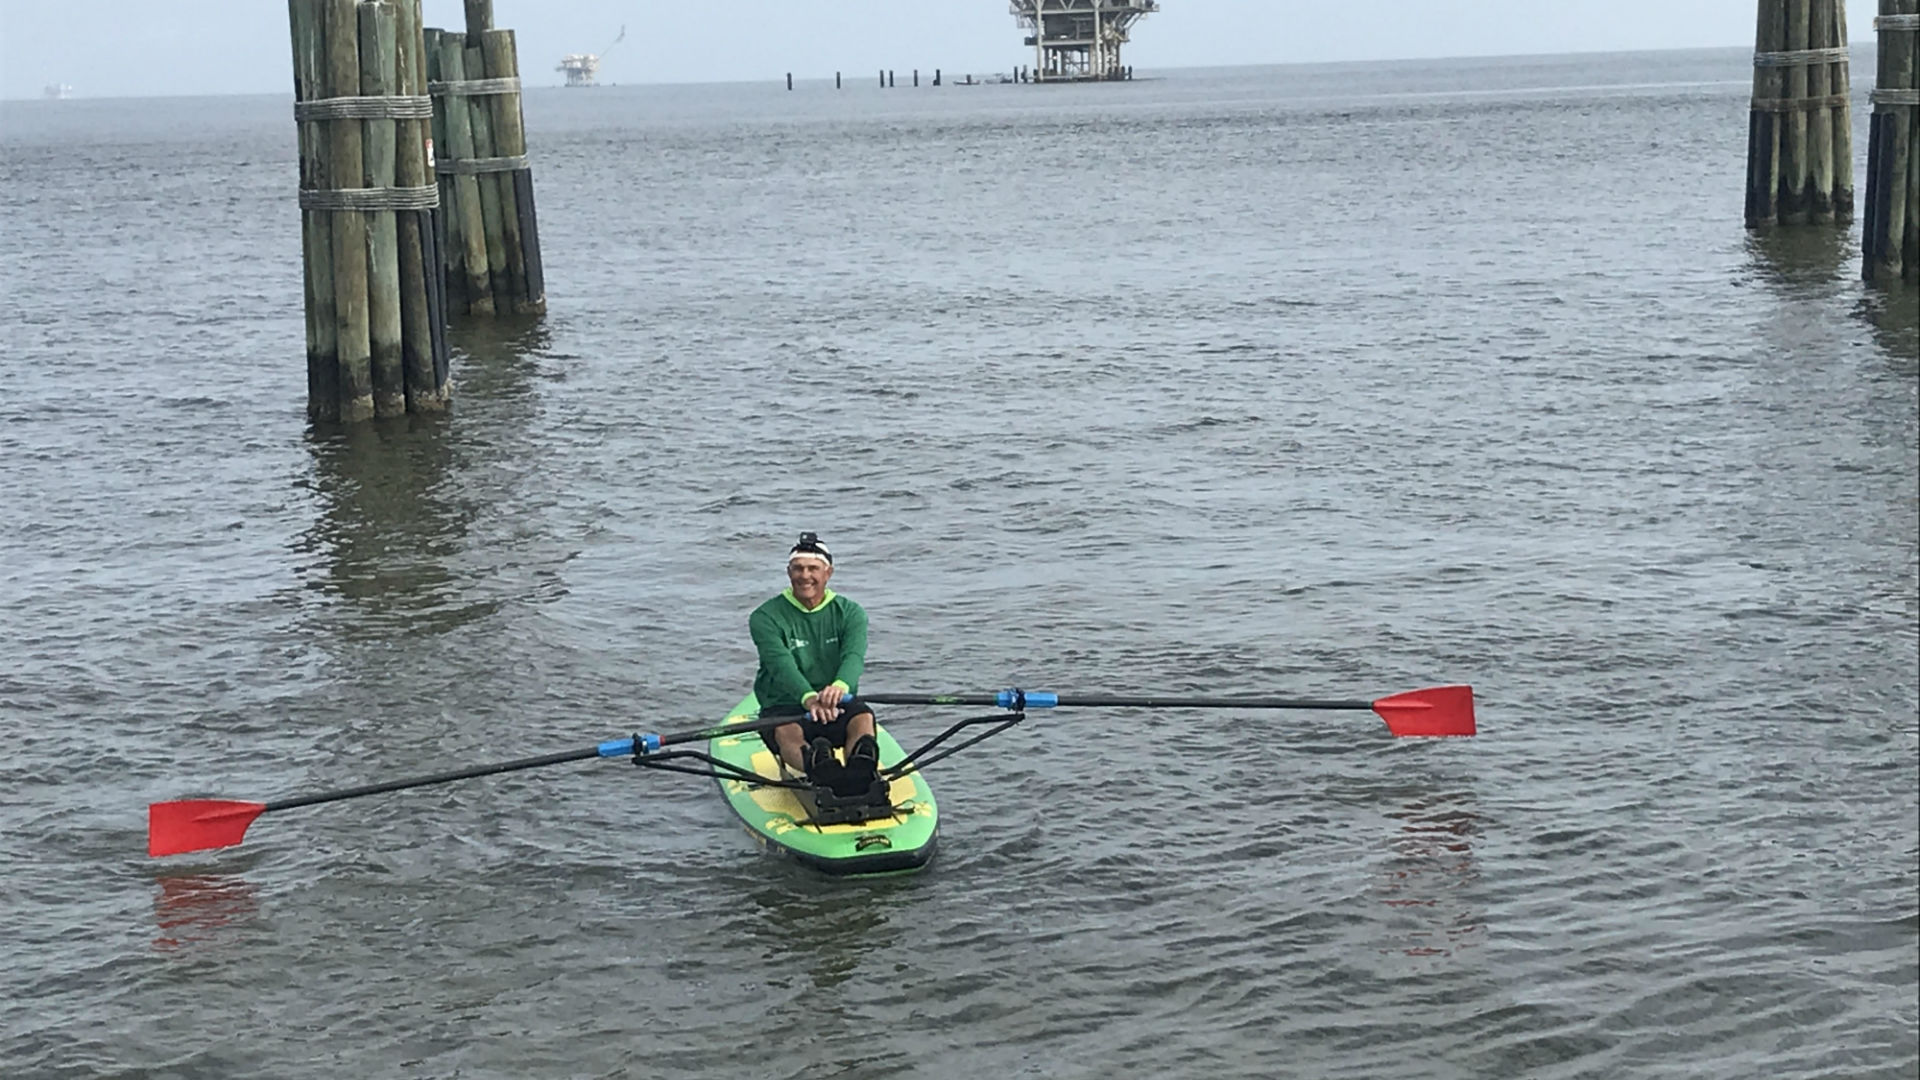 Oar-Board-Rowing-DAV-Victories-Veterans-Michael-Rawlings-Adaptive